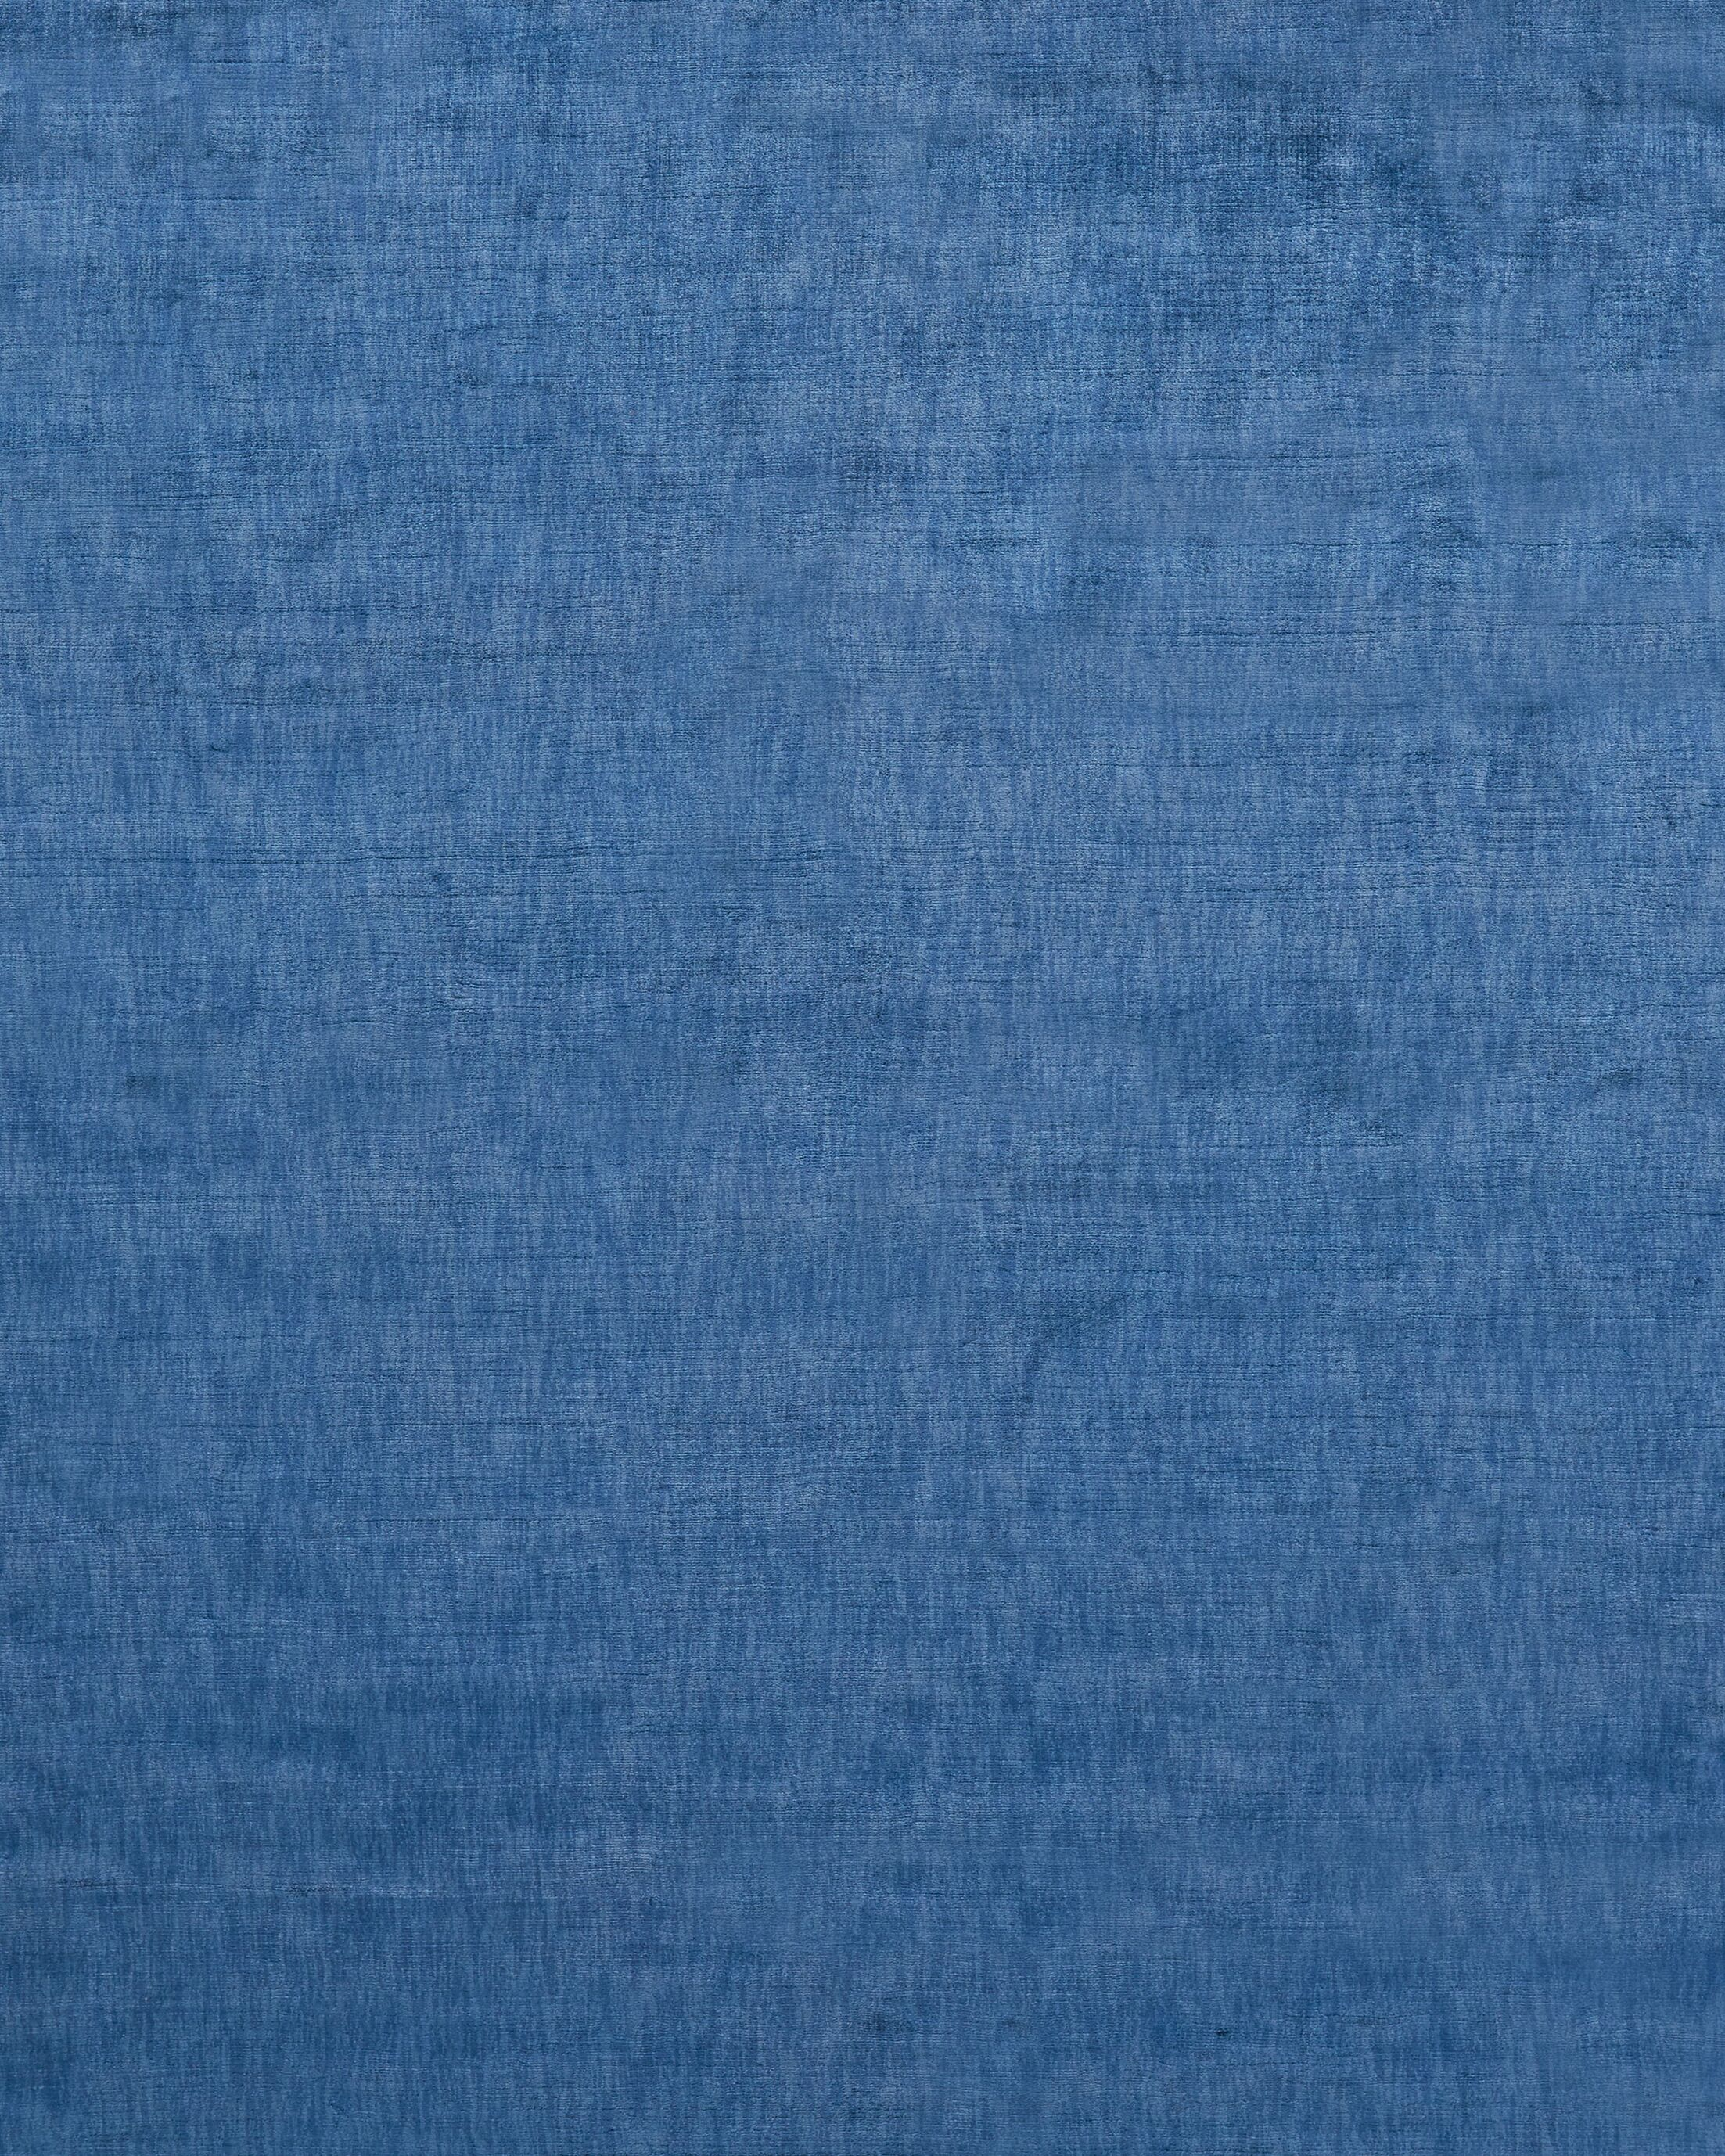 Rasmussen Hand-Woven Royal Area Rug Rug Size: Rectangle 9'6